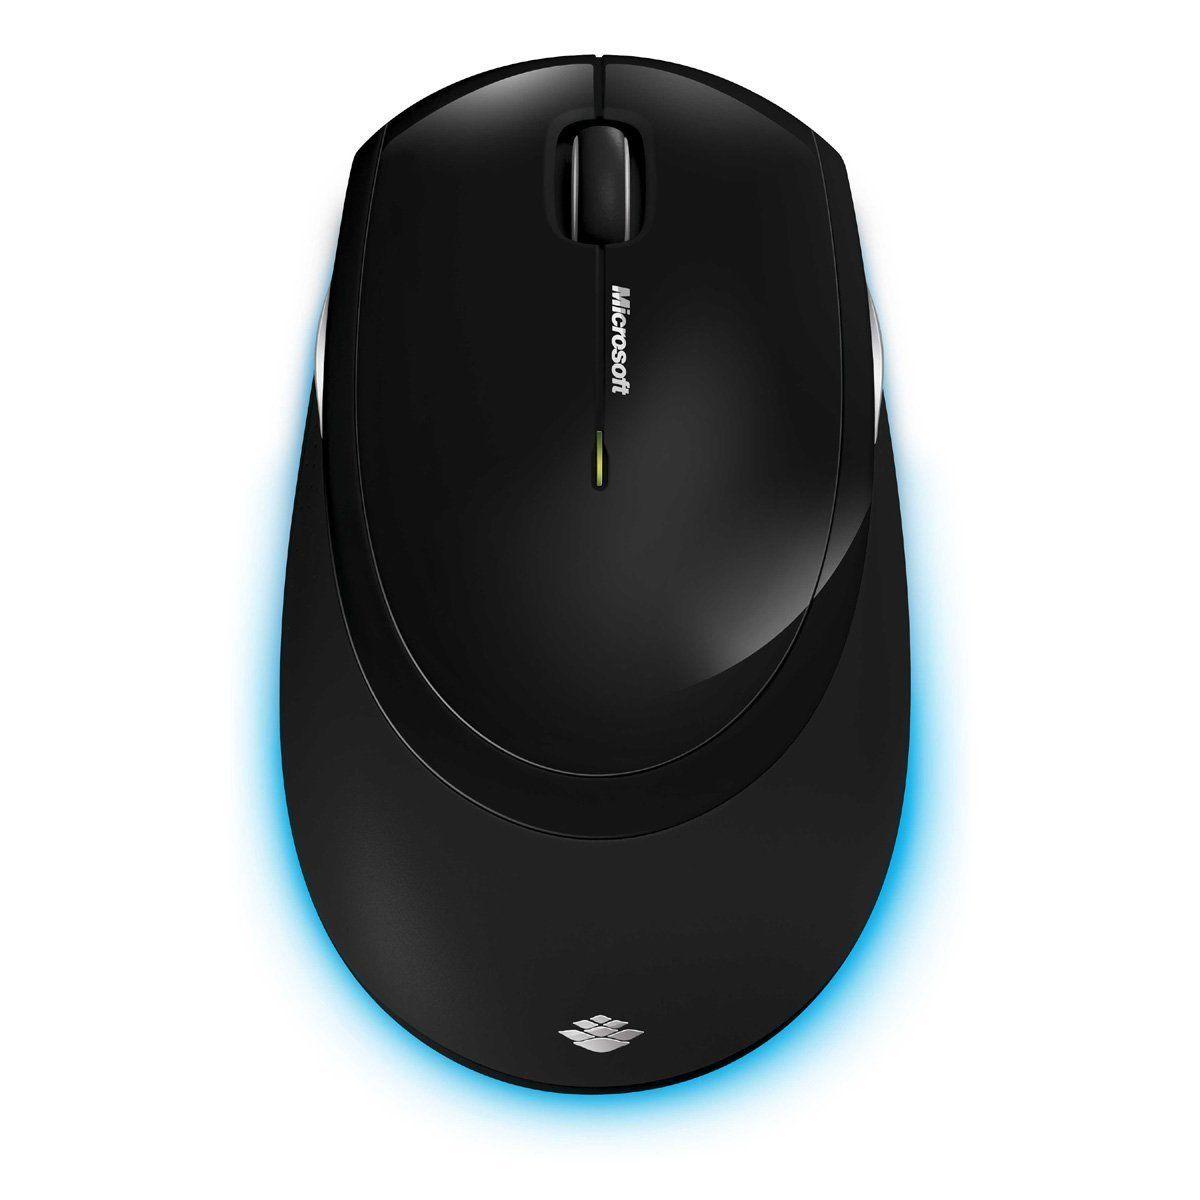 Microsoft Wireless Comfort Desktop 5000 Keyboard and Mouse - Black 4